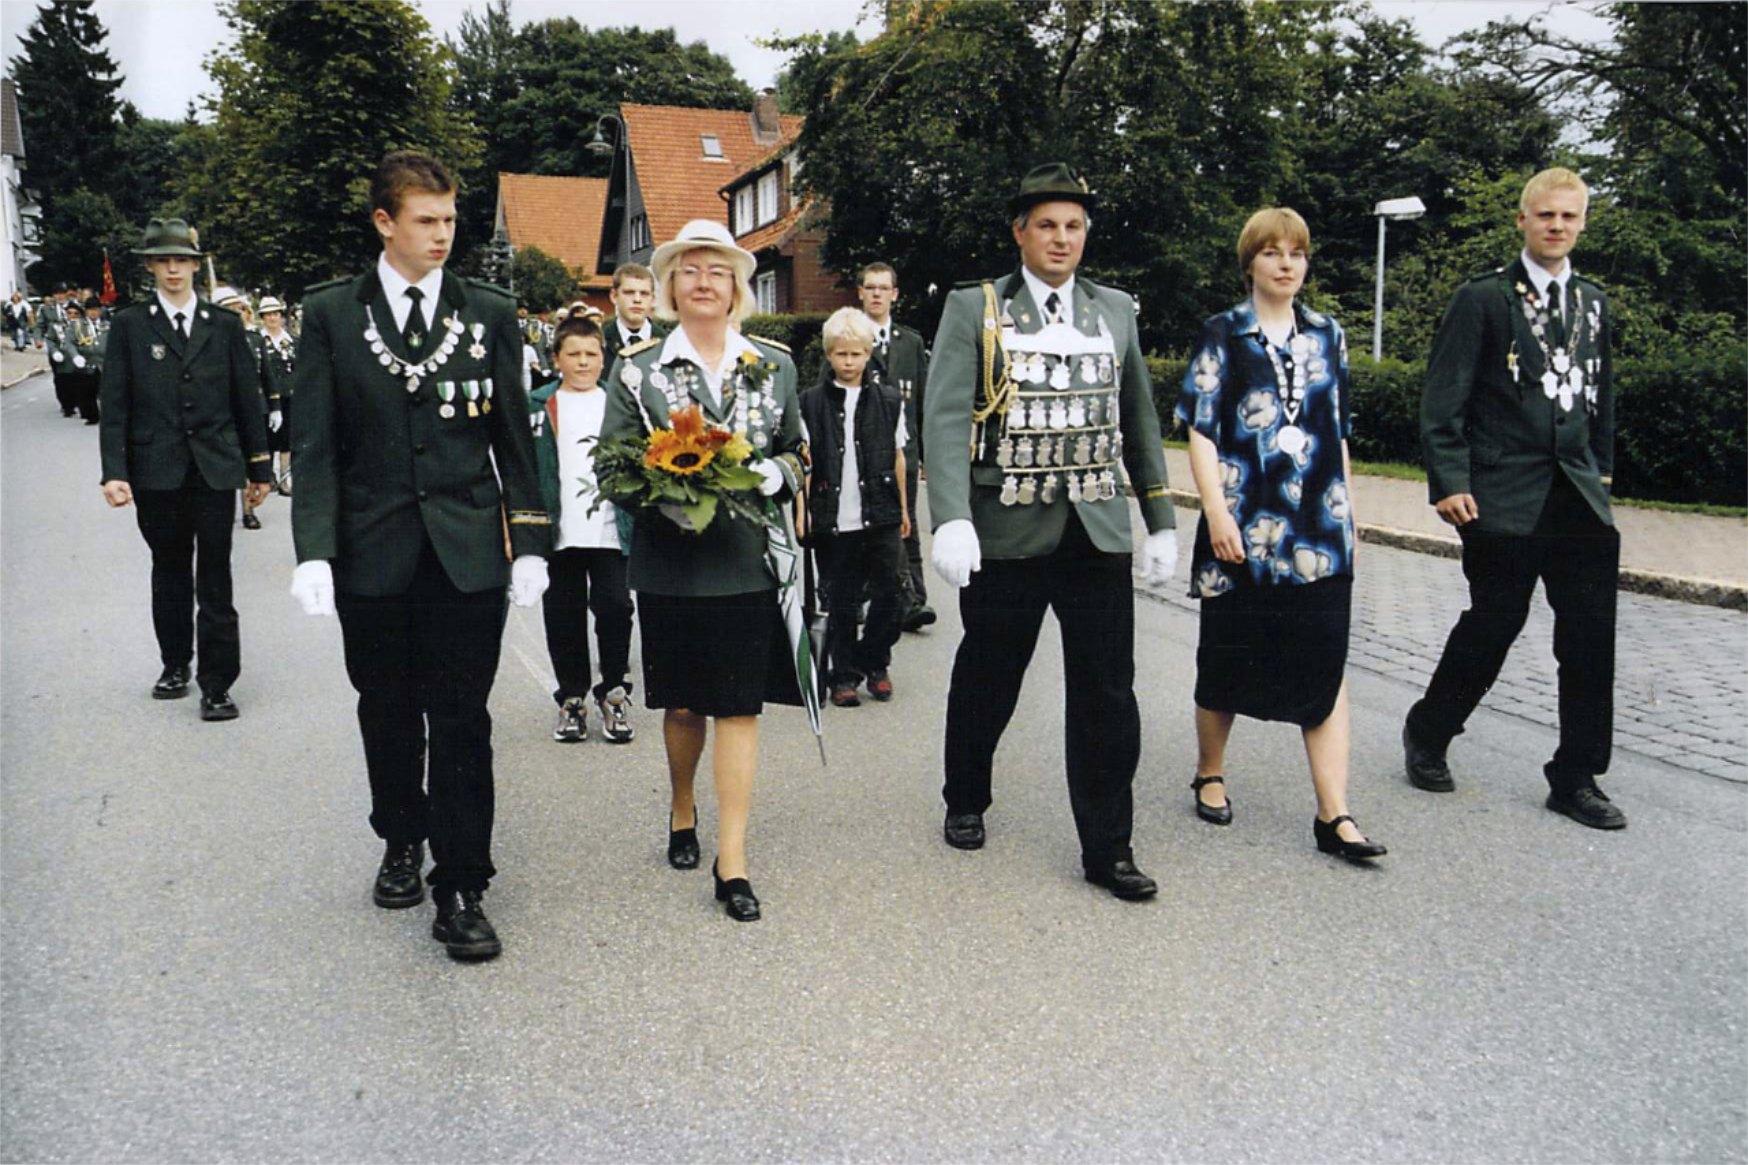 Schützenkönige 2001